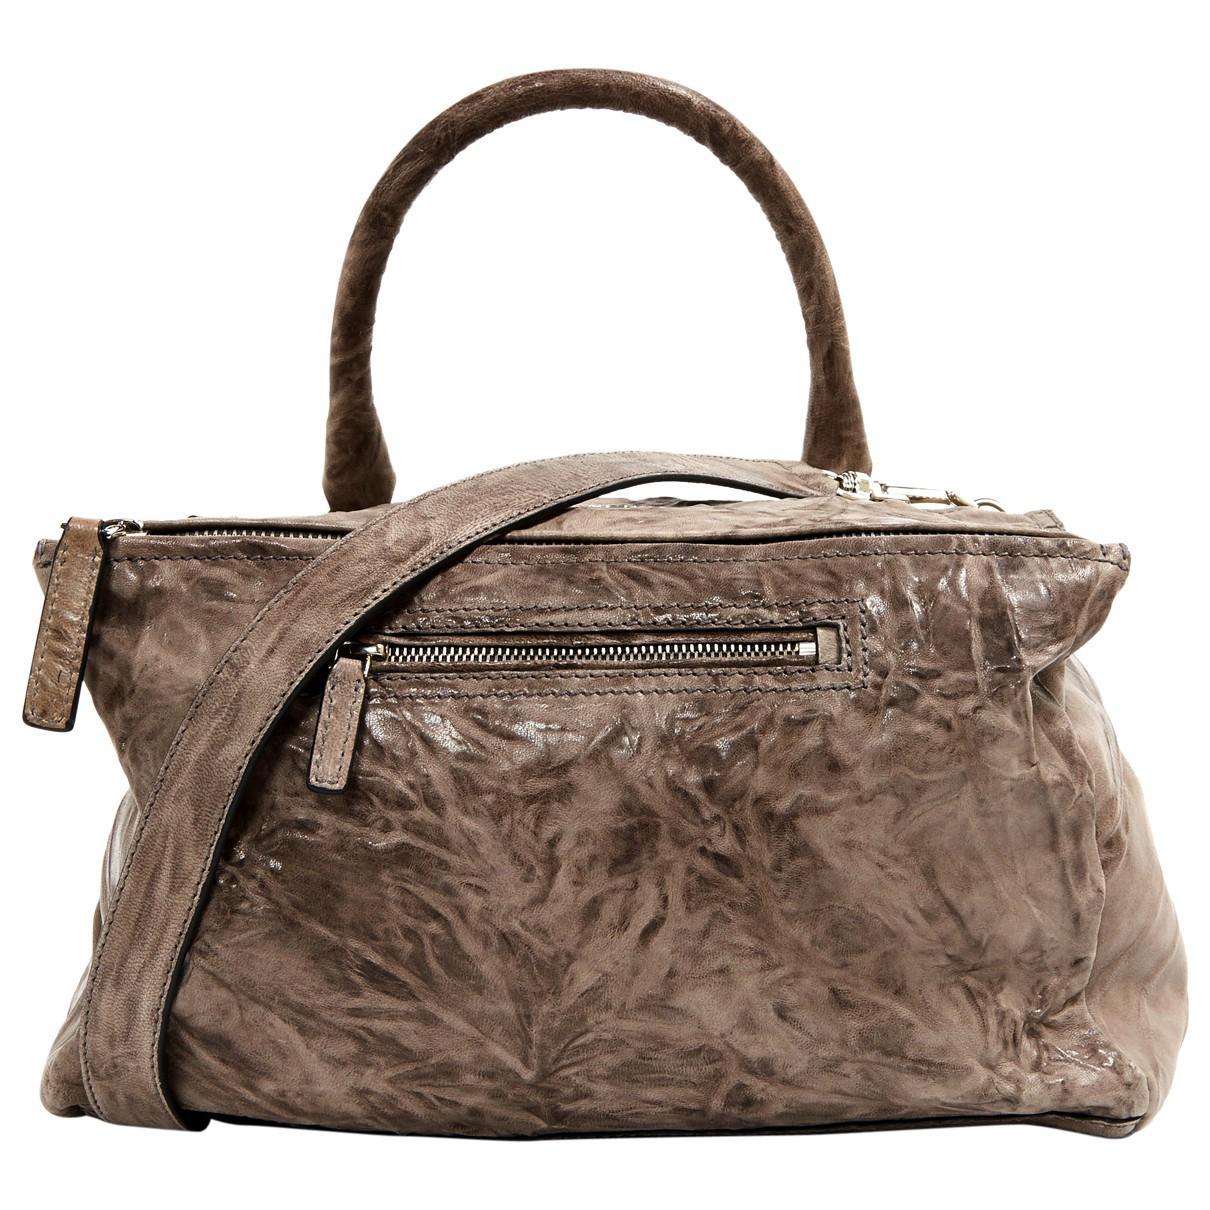 Givenchy Pre-owned - Beige Leather Handbag Pandora 4o8c6s